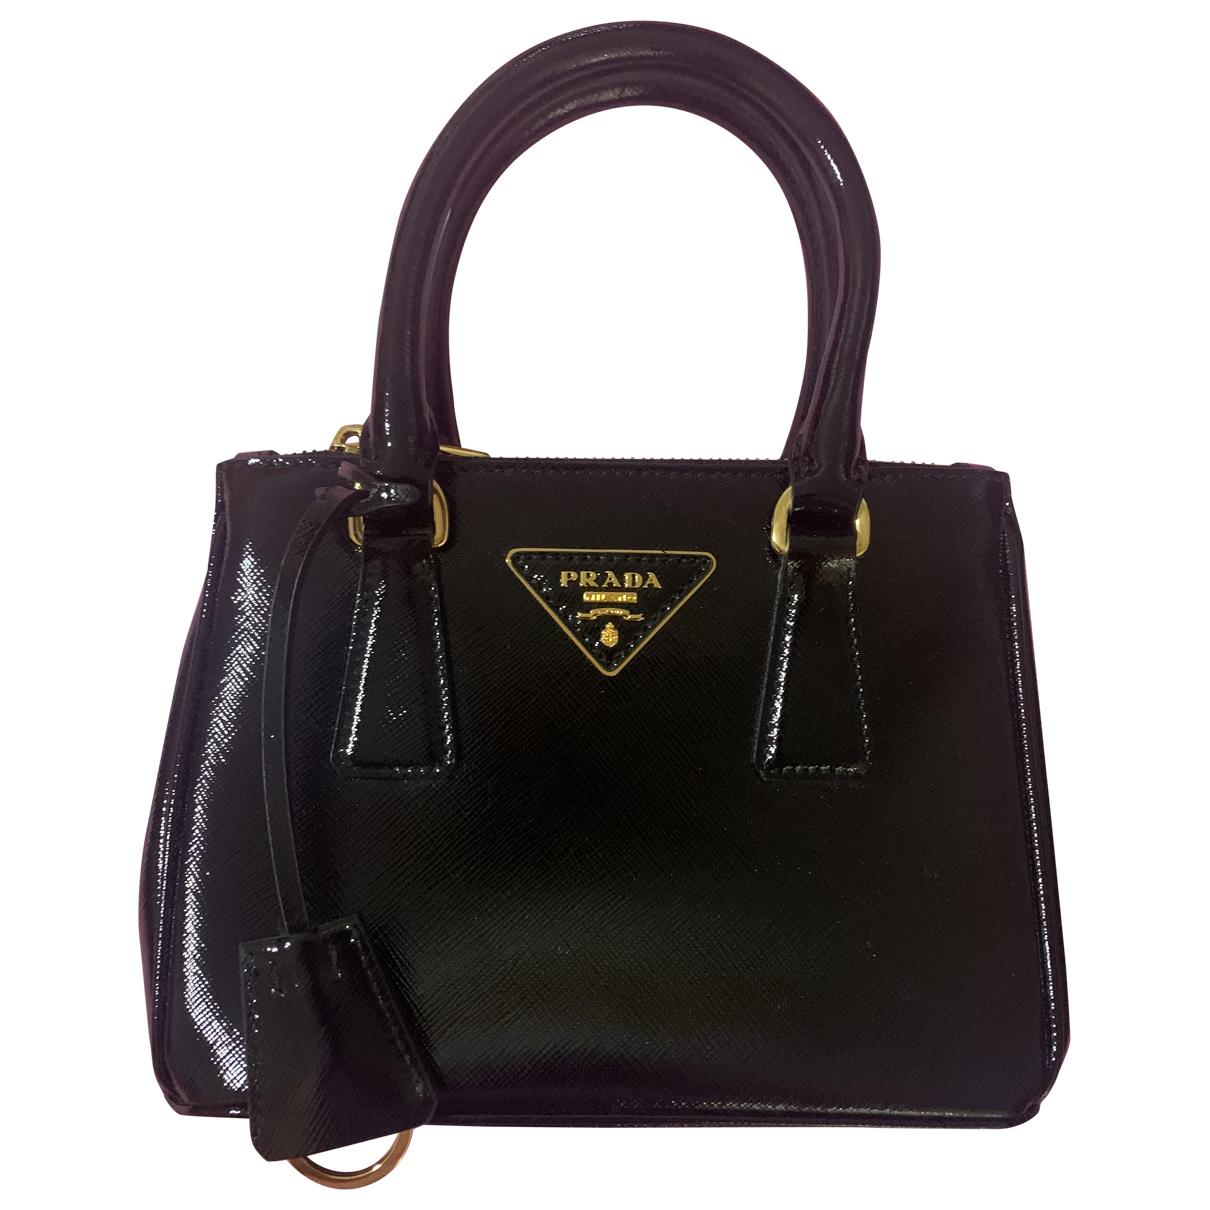 Prada Galleria Black Patent leather handbag for Women \N